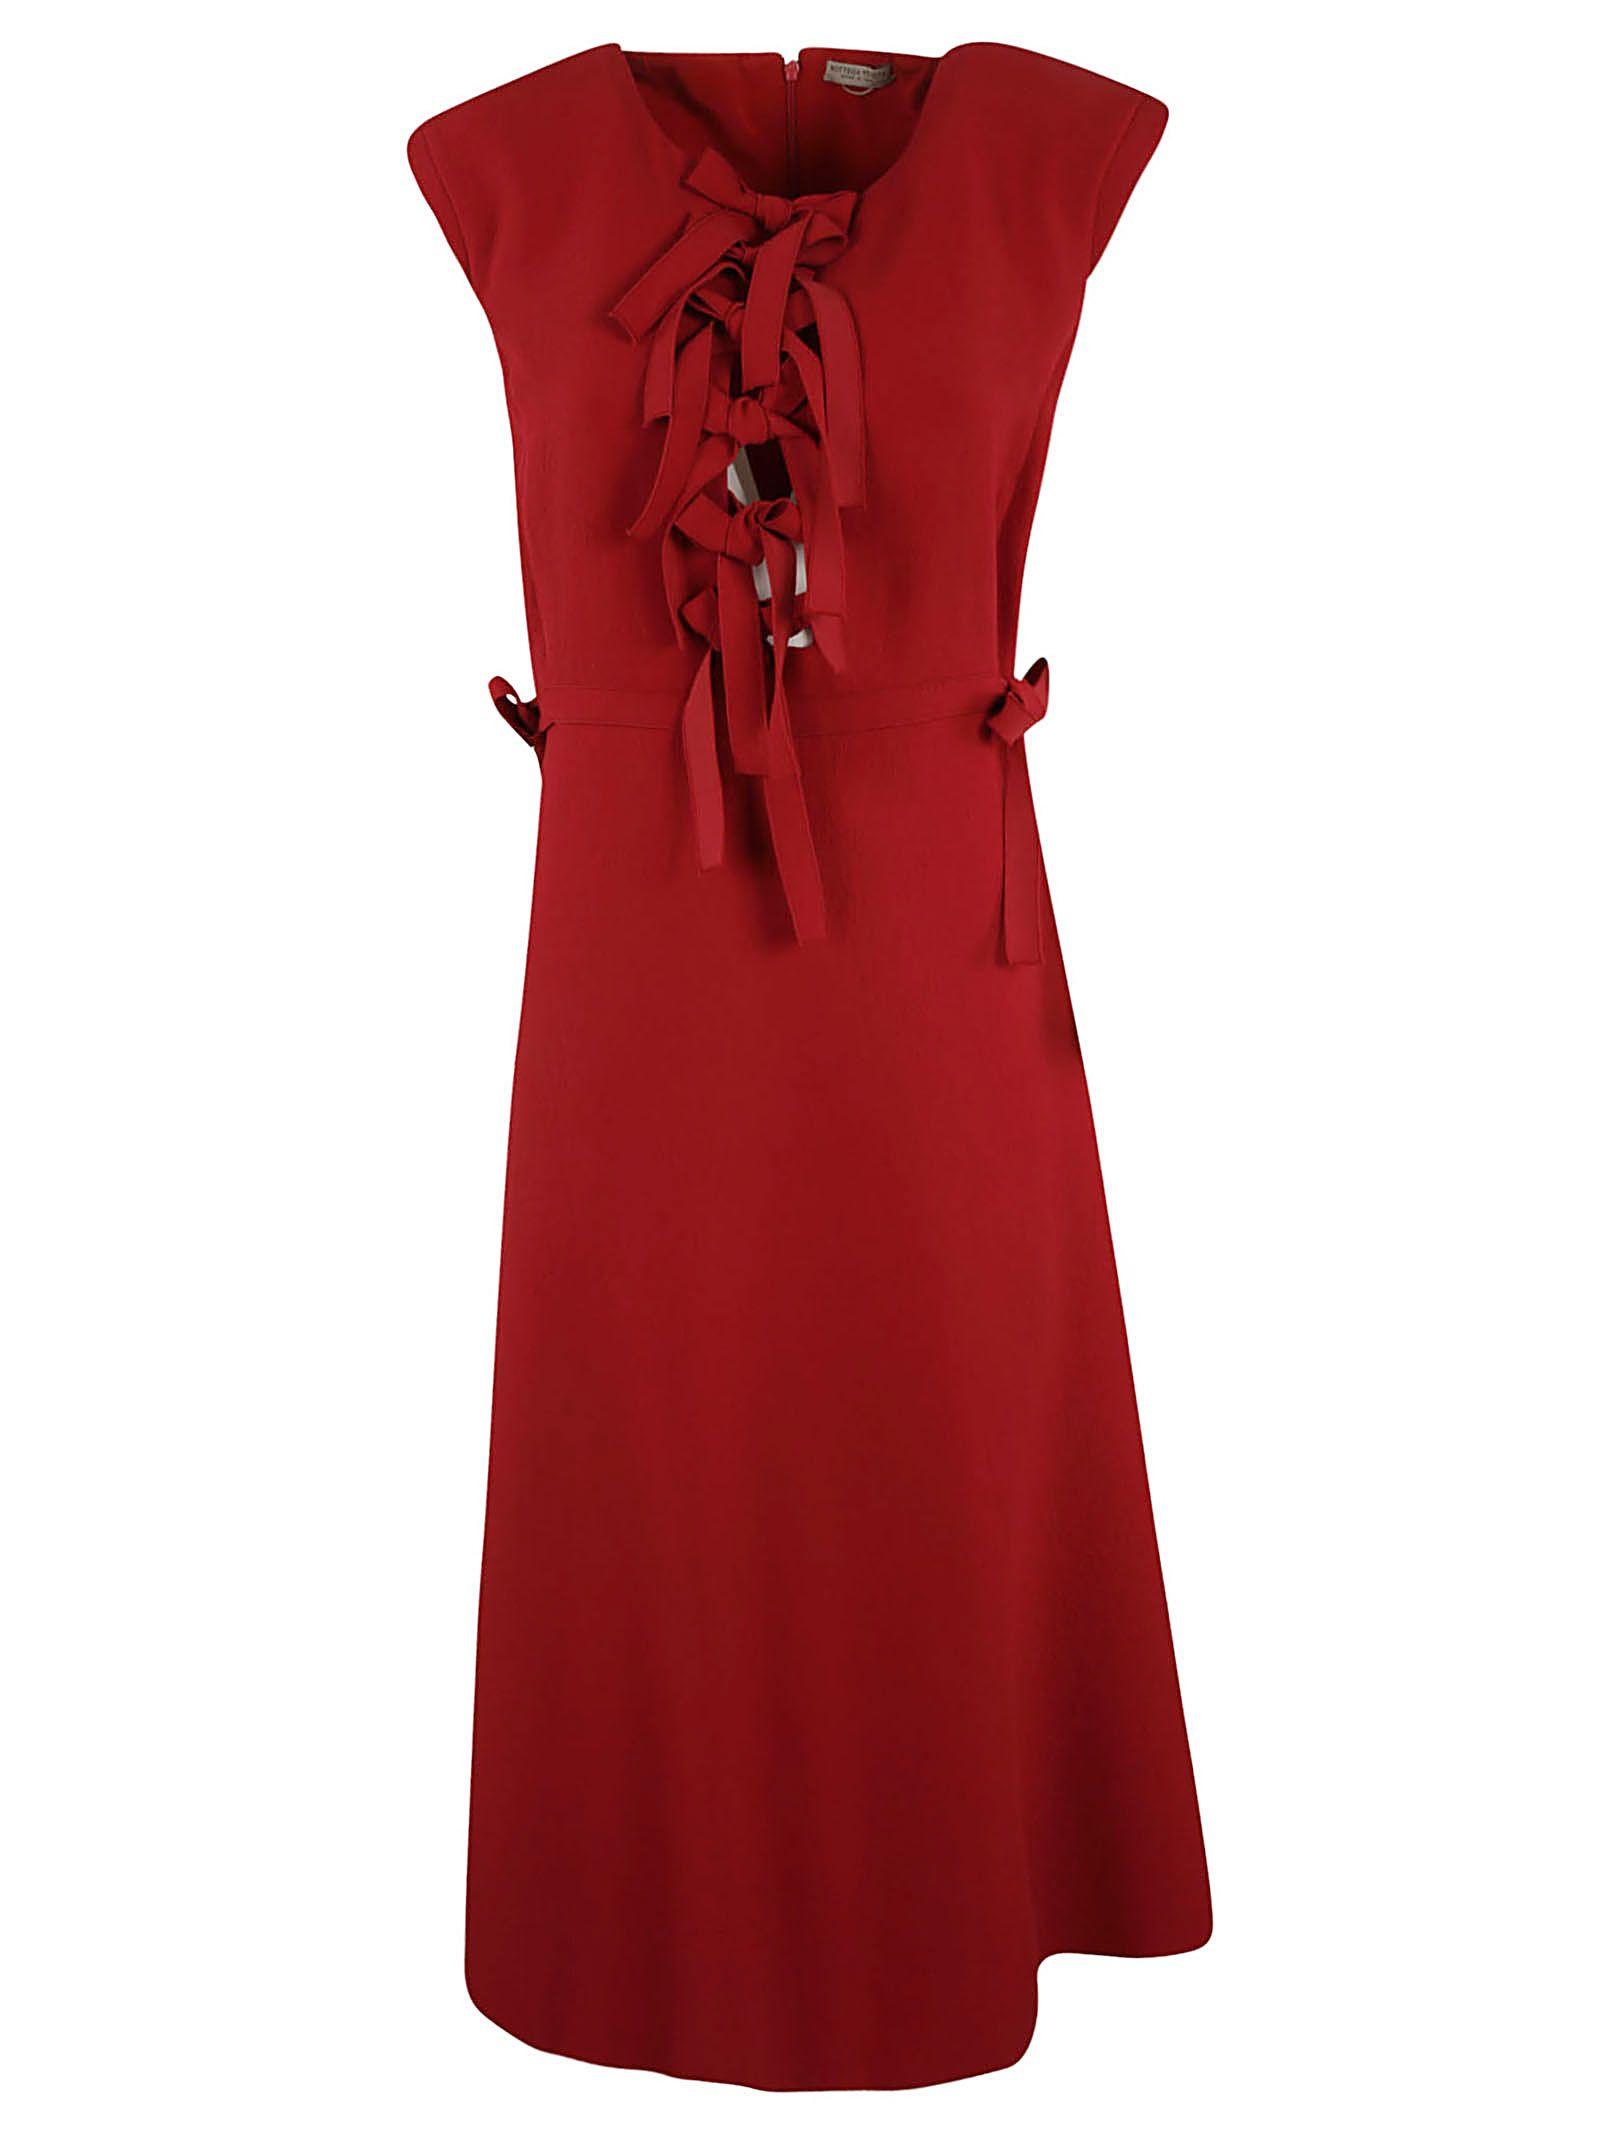 Bottega Veneta Bow Detail Midi Dress